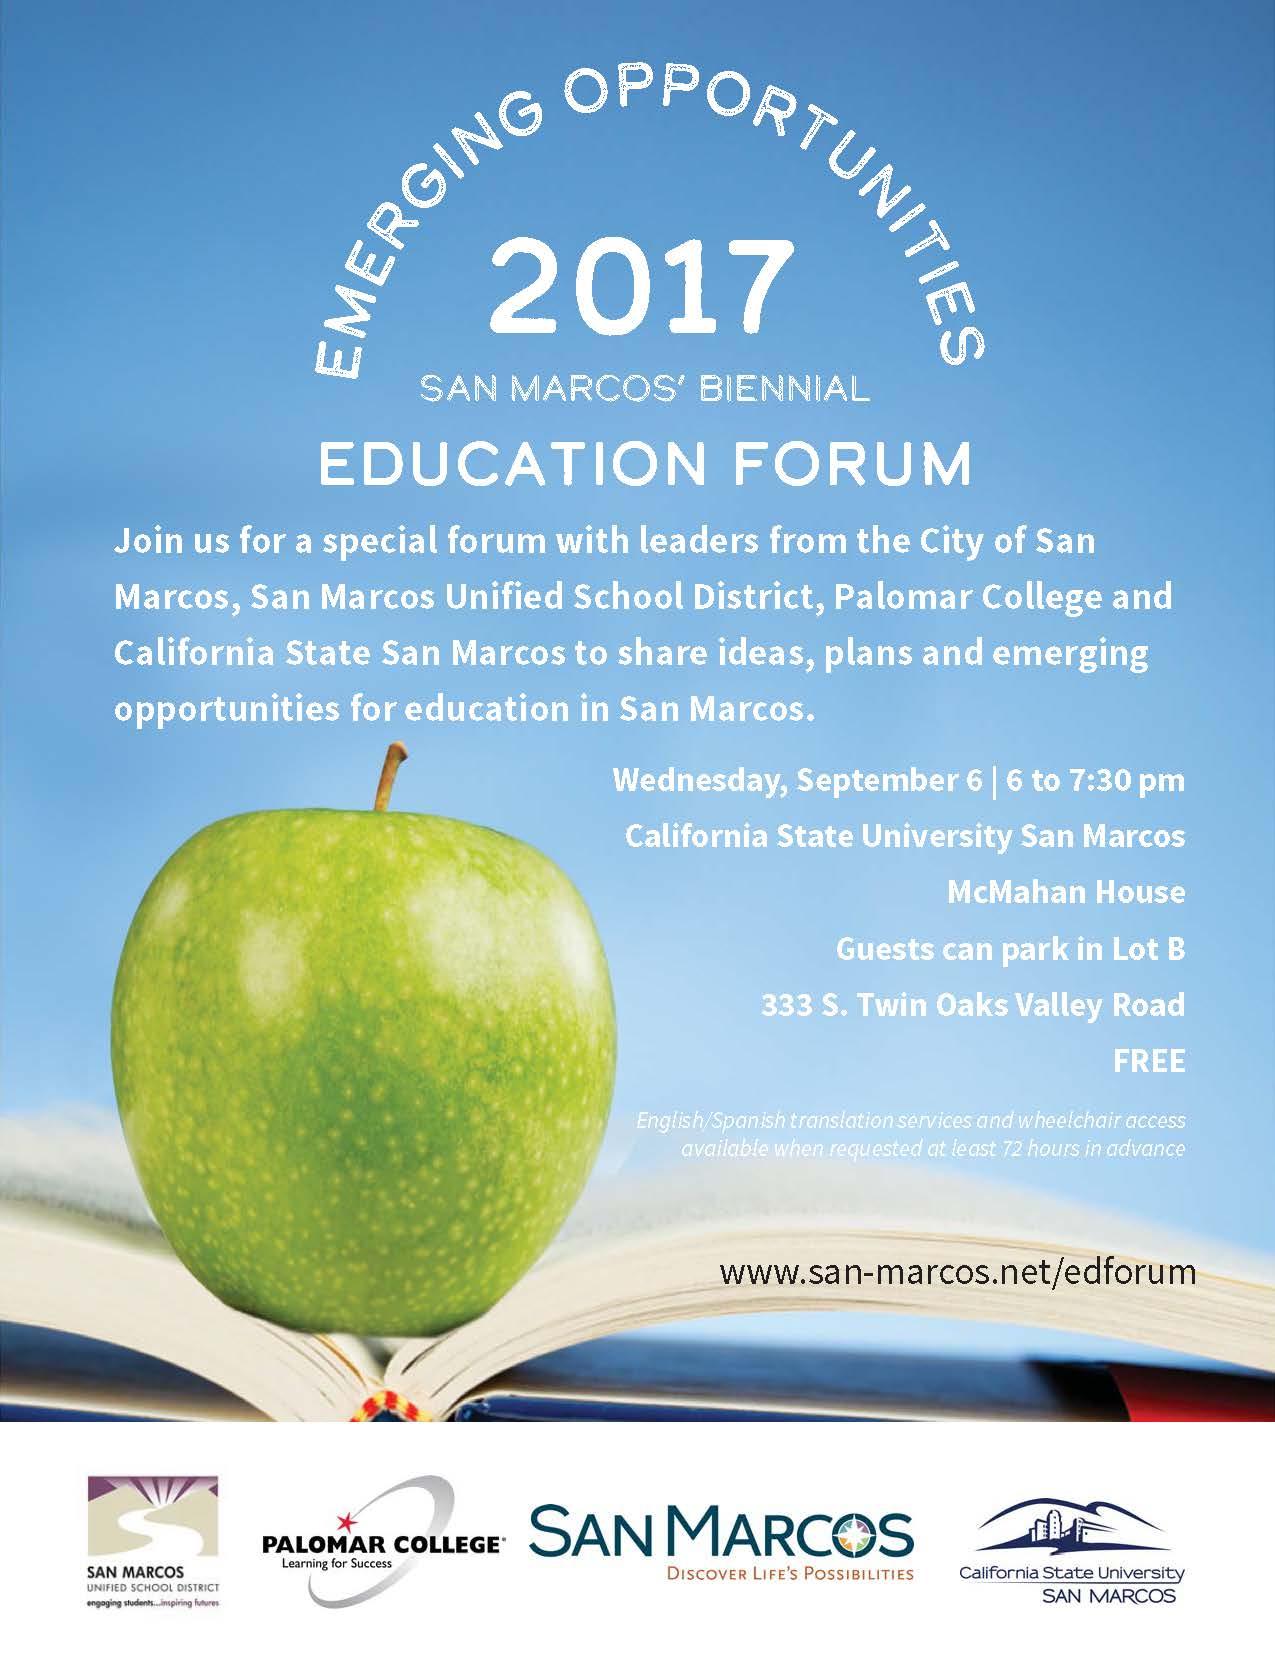 2017 Education Forum Invitation